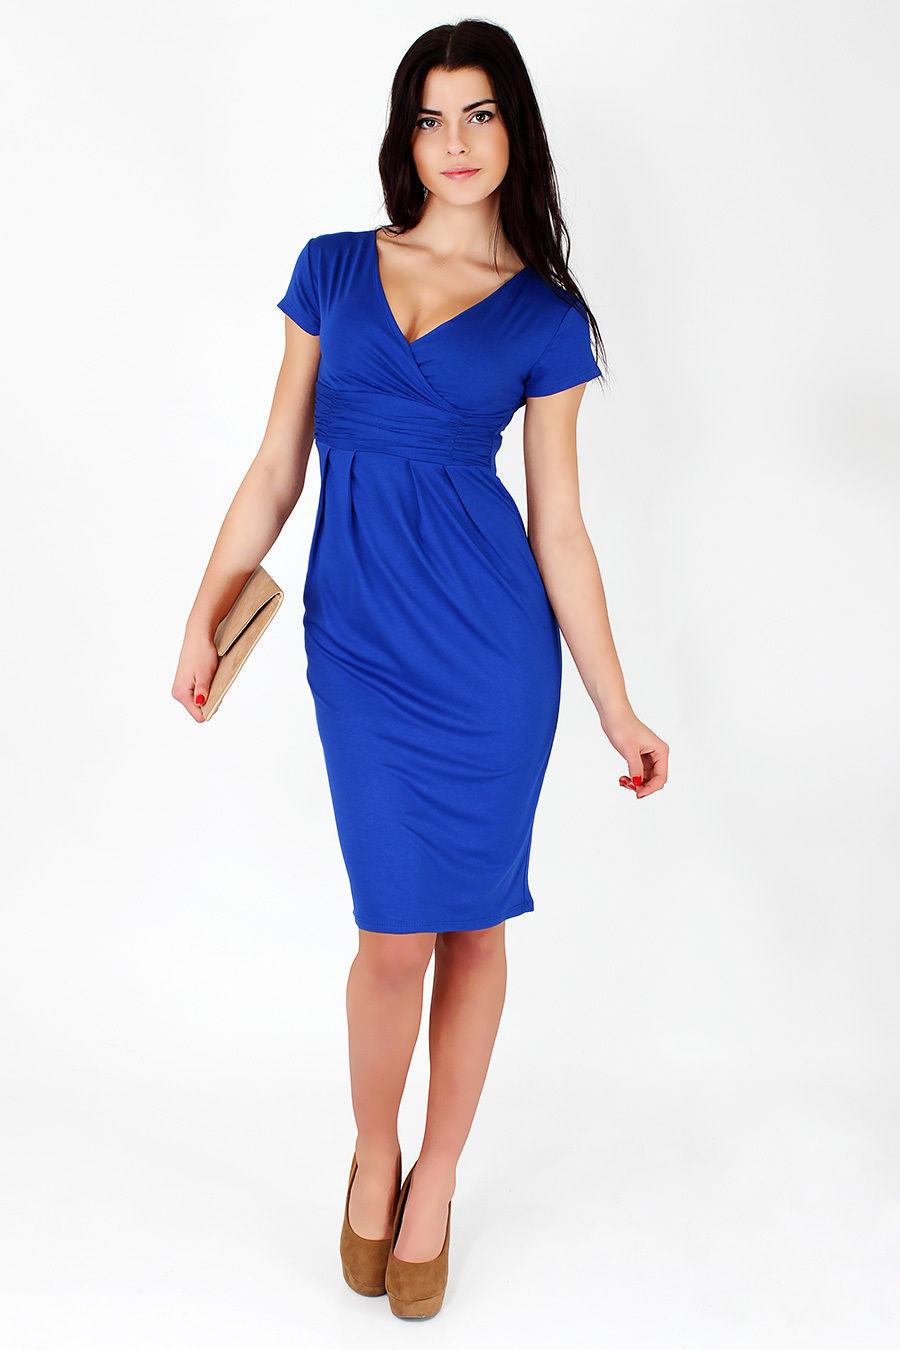 new desigual summer dress 2015 v neck knee length